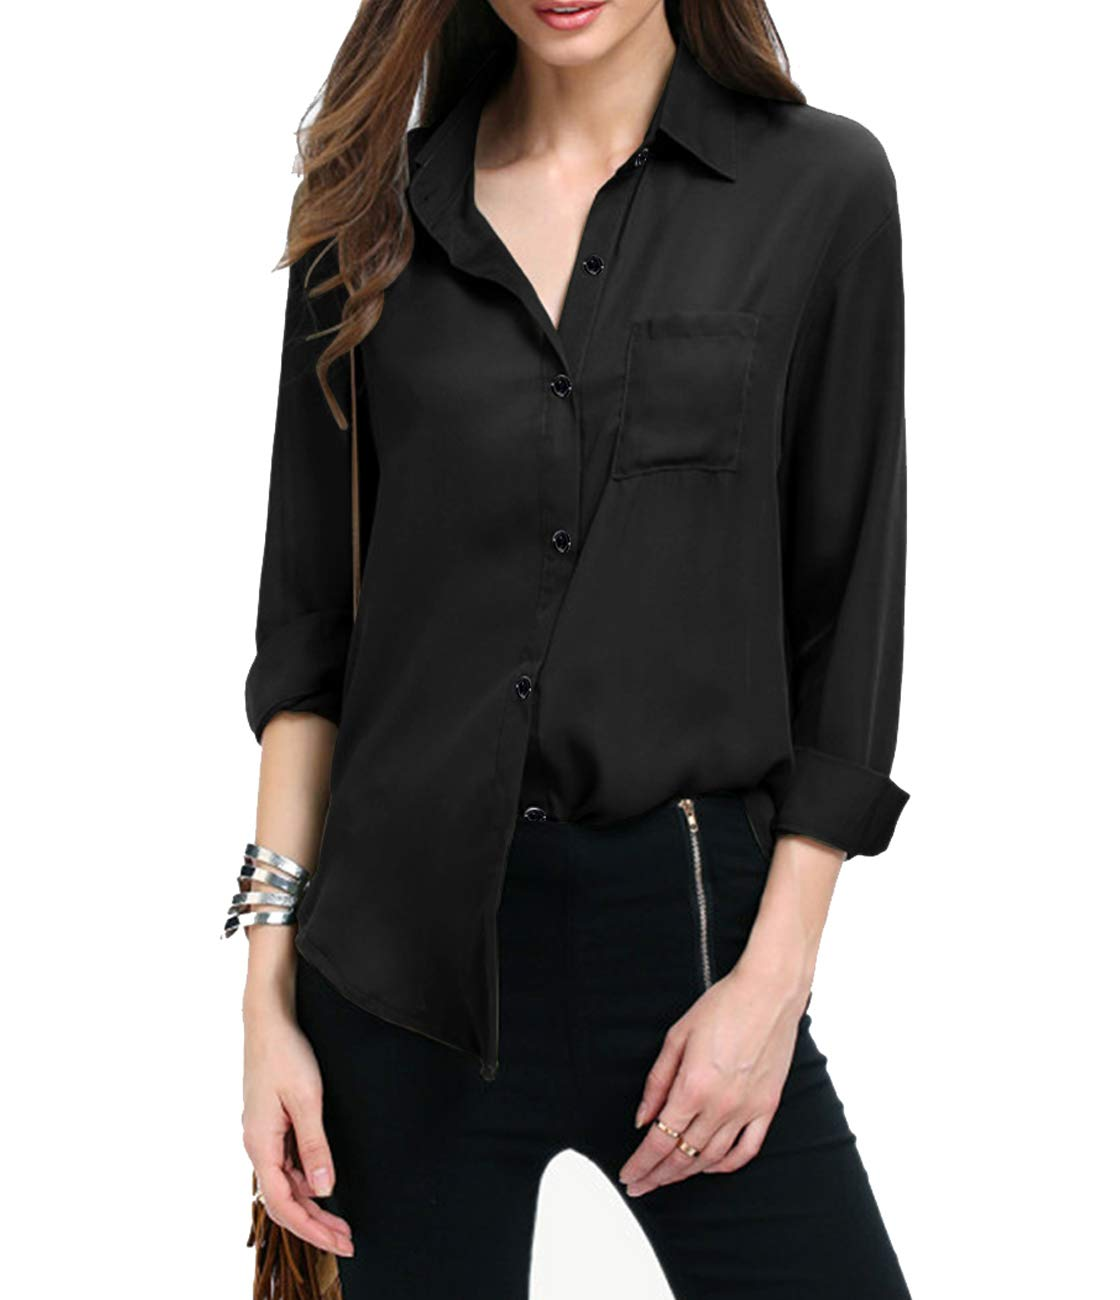 YOOKI Women Autumn Dresses Long Sleeve Chiffon Shirt Boxy Blouse Button Down Chiffon Blouse Shirts Tops with Chest Pocket (L, Black)